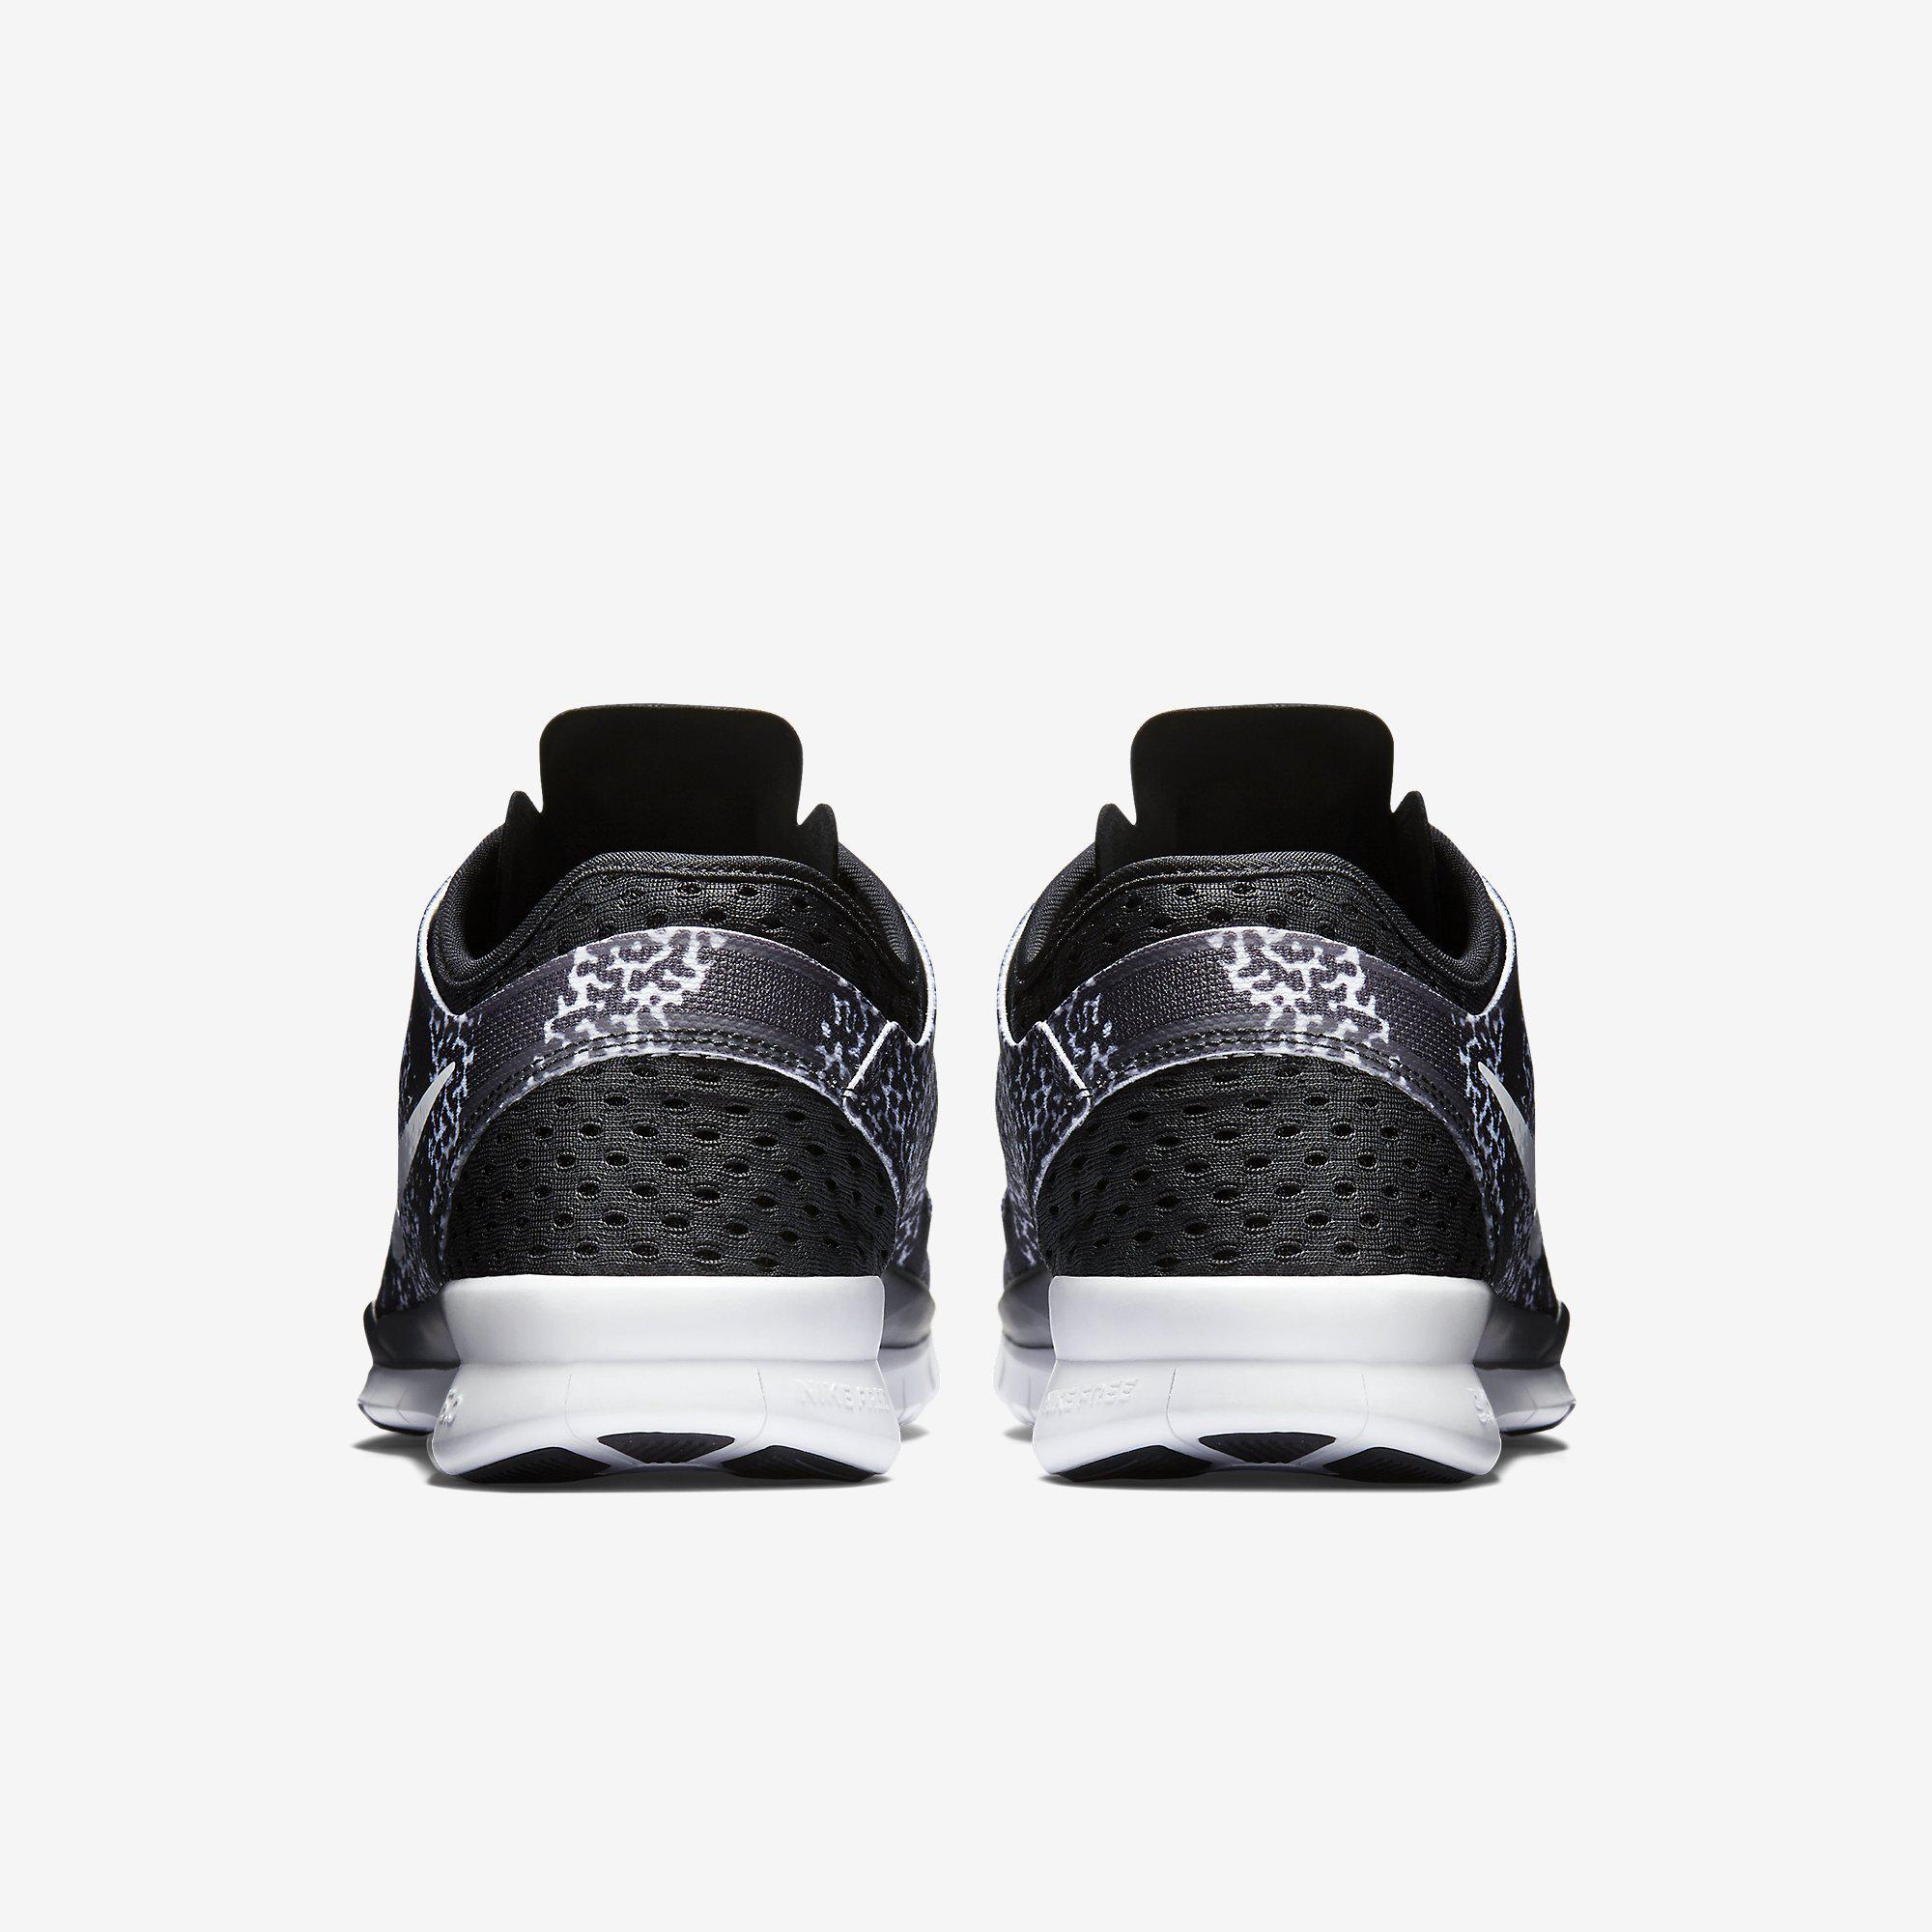 Nike Free 5.0 Tr Fit 5 Prt Foto In Bianco E Nero sCJS27